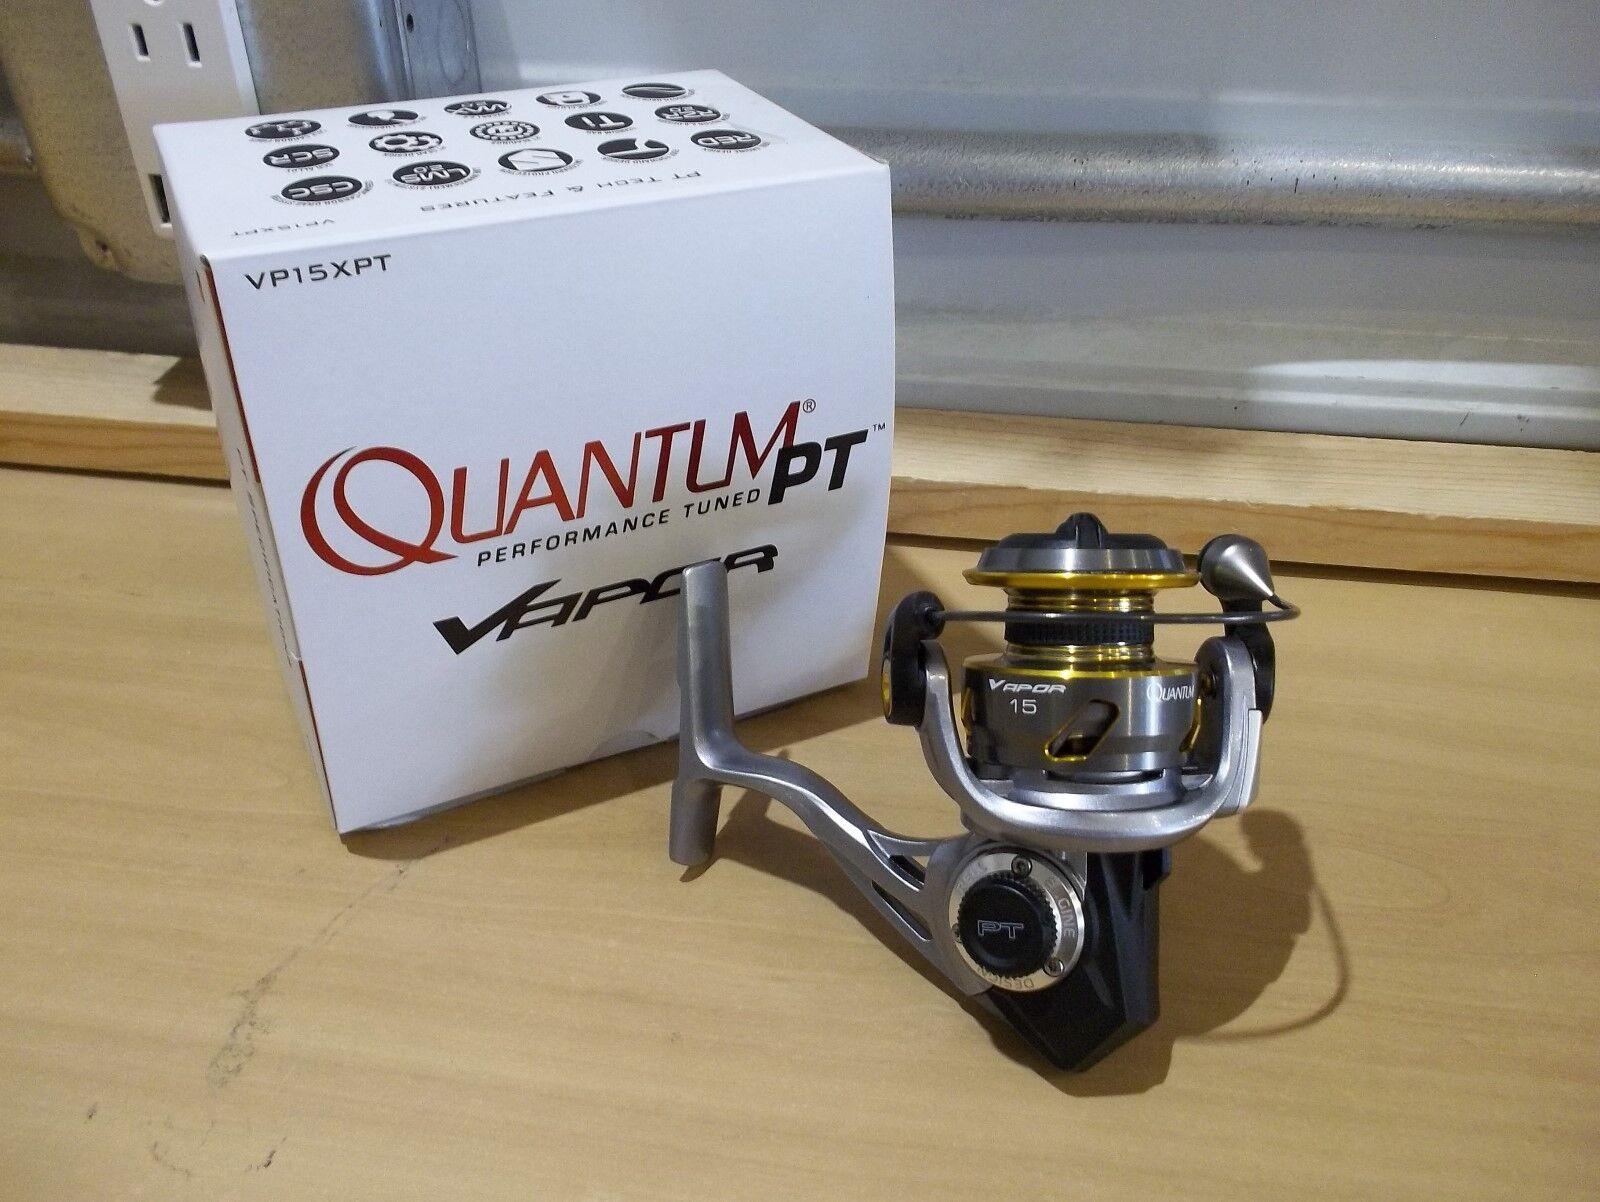 QUANTUM Vapor VP15XPT spinning  reel NIB  welcome to buy